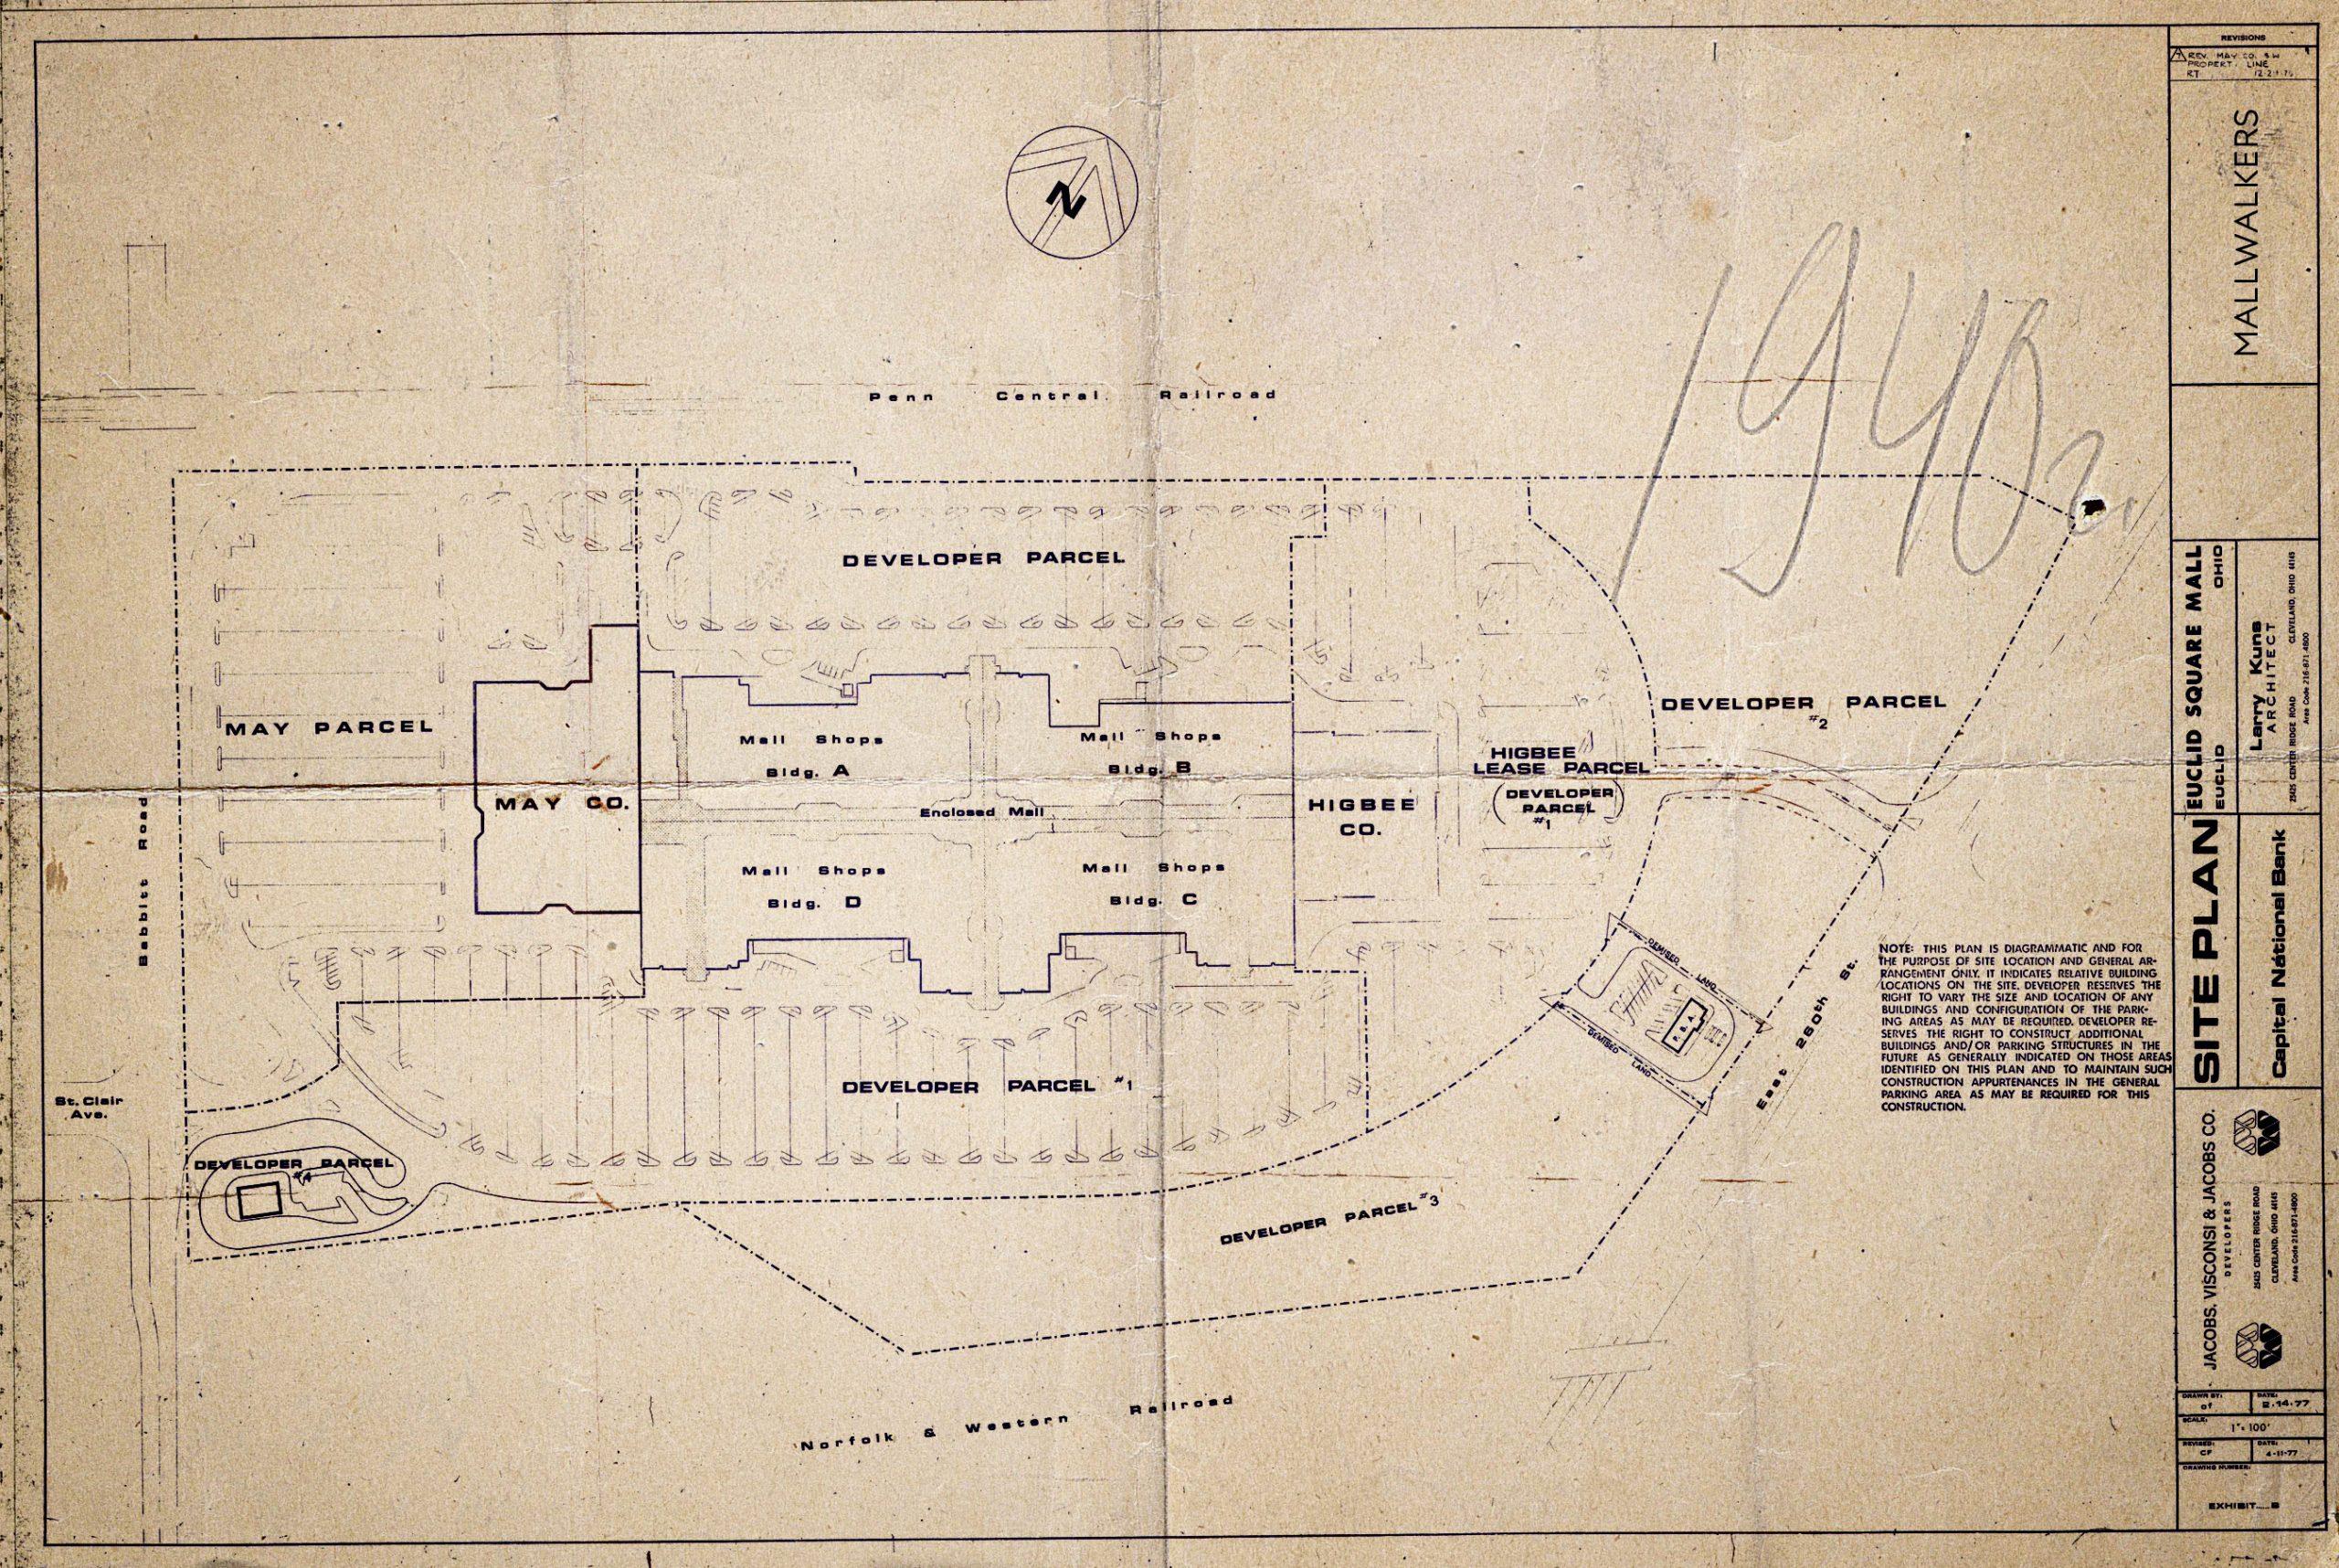 Euclid Square Mall Blueprint